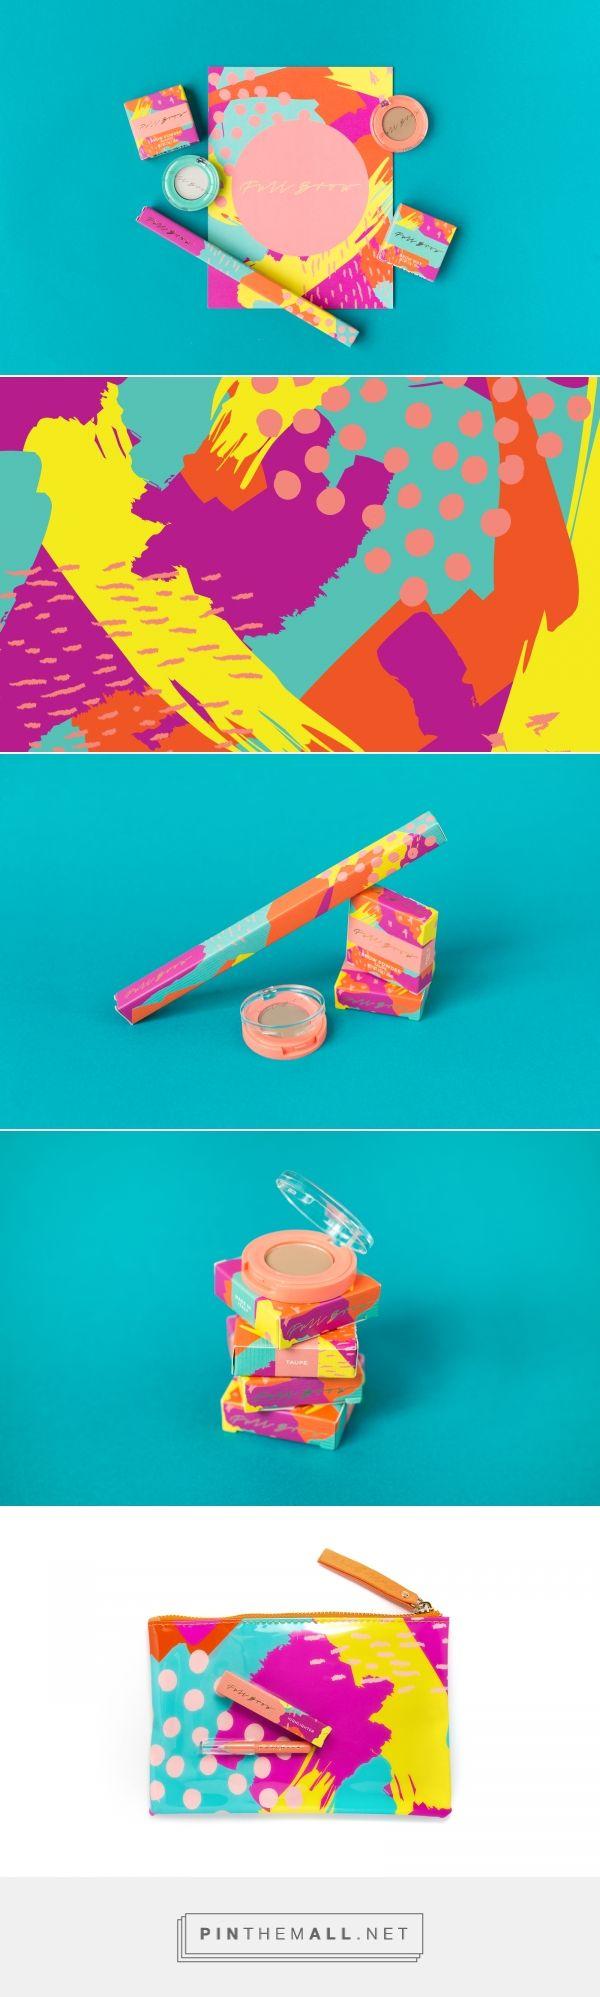 Full Brow - Eye Brow Make-up Packaging by Susu Studio   Fivestar Branding Agency – Design and Branding Agency & Curated Inspiration Gallery